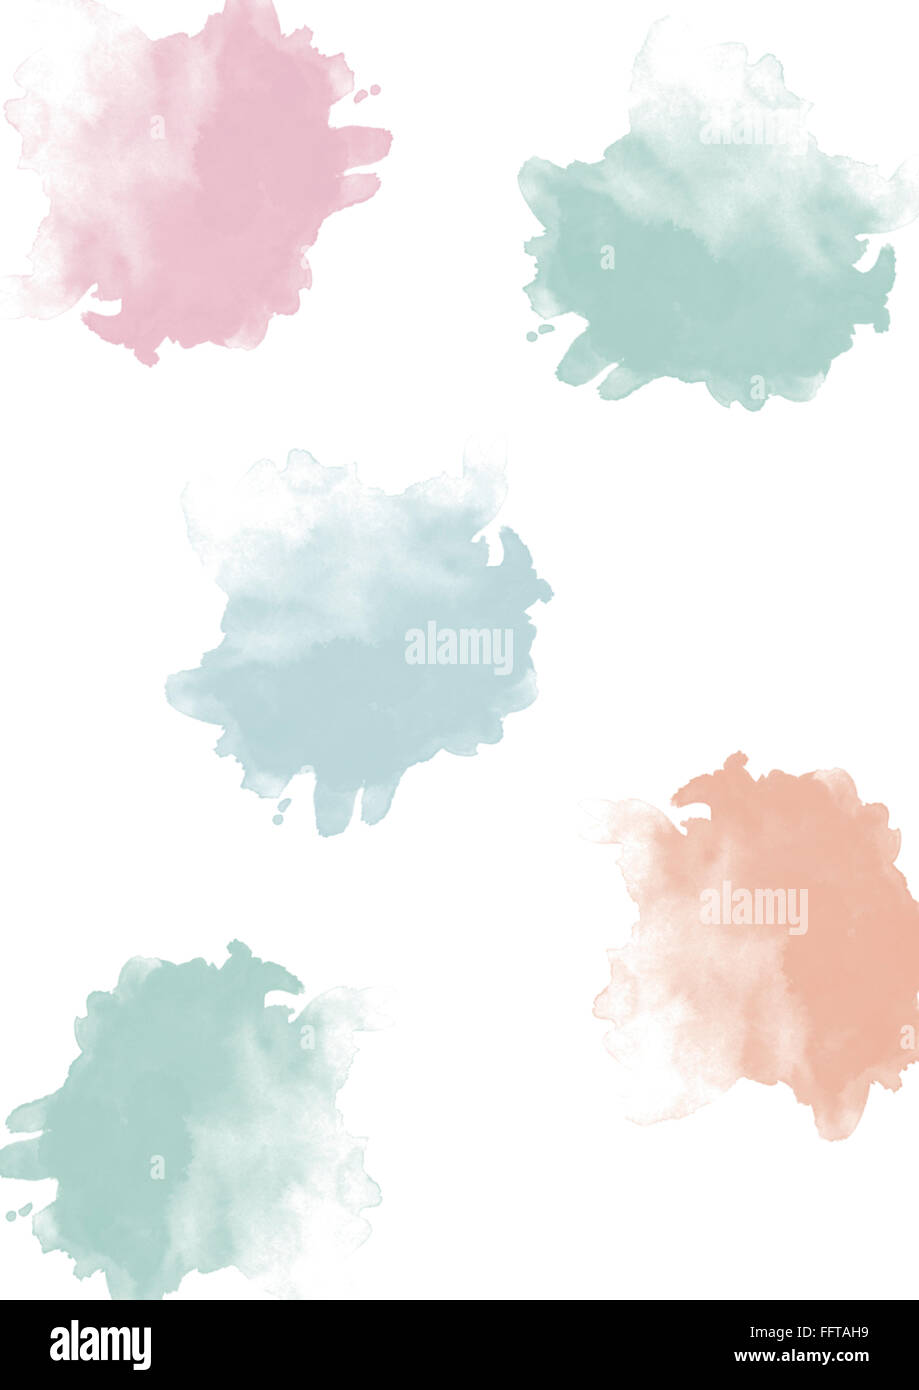 Aquarell Klecks Kleckse Dots Punkte bunt Aquarellfarbe Muster Aquarellstruktur farbenfroh blau rot gruen pink hellgruen Stock Photo